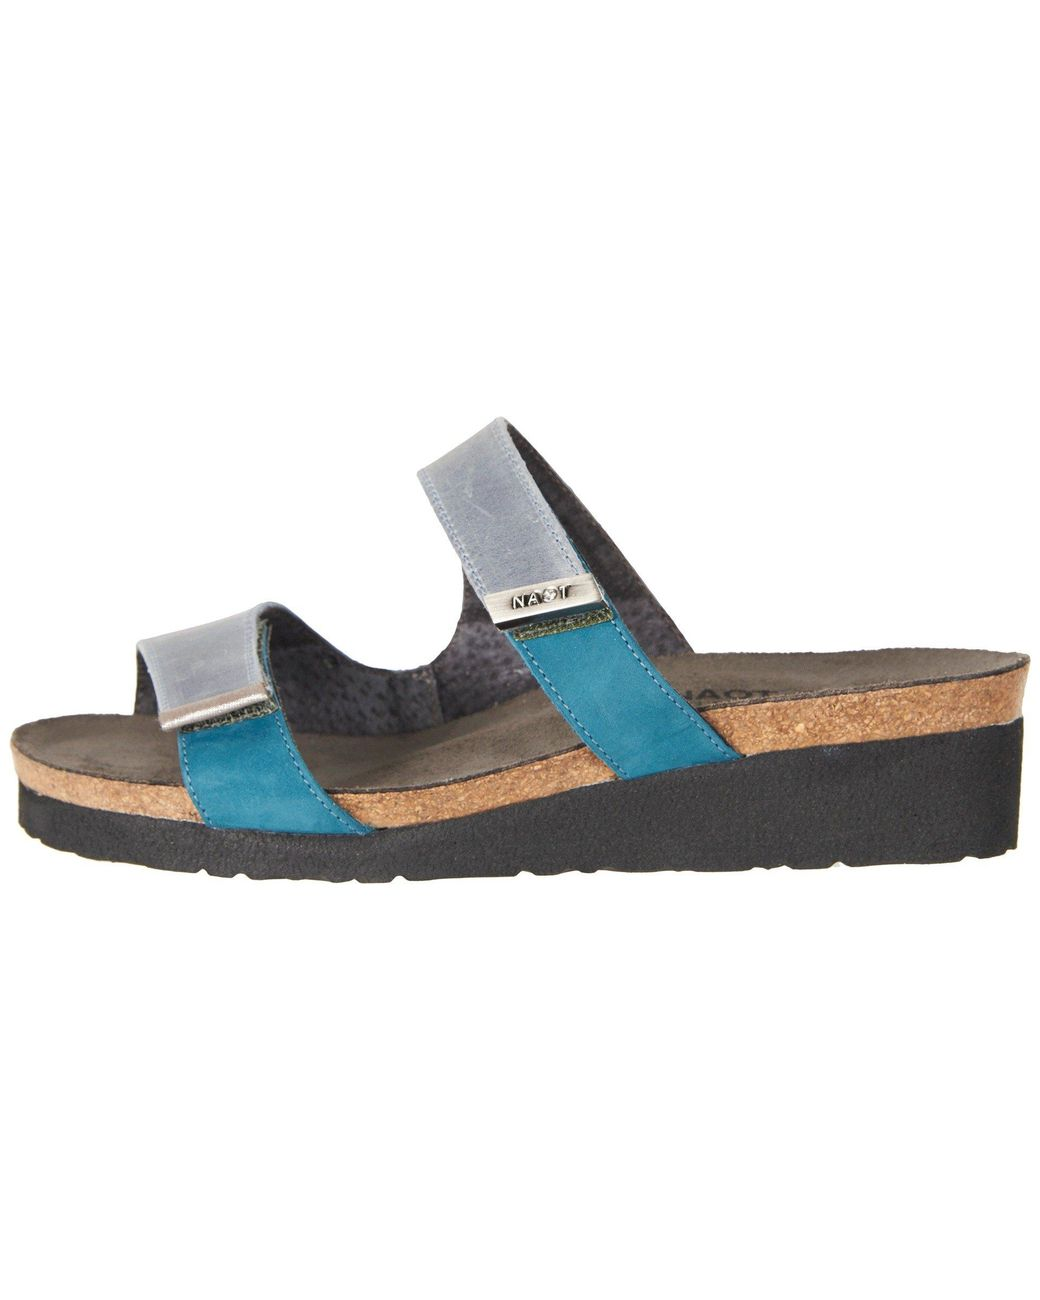 a0642226a5c0 Lyst - Naot Jacey - Wide (navy Velvet Nubuck oily Blue Leather oily Coal  Nubuck) Women s Shoes